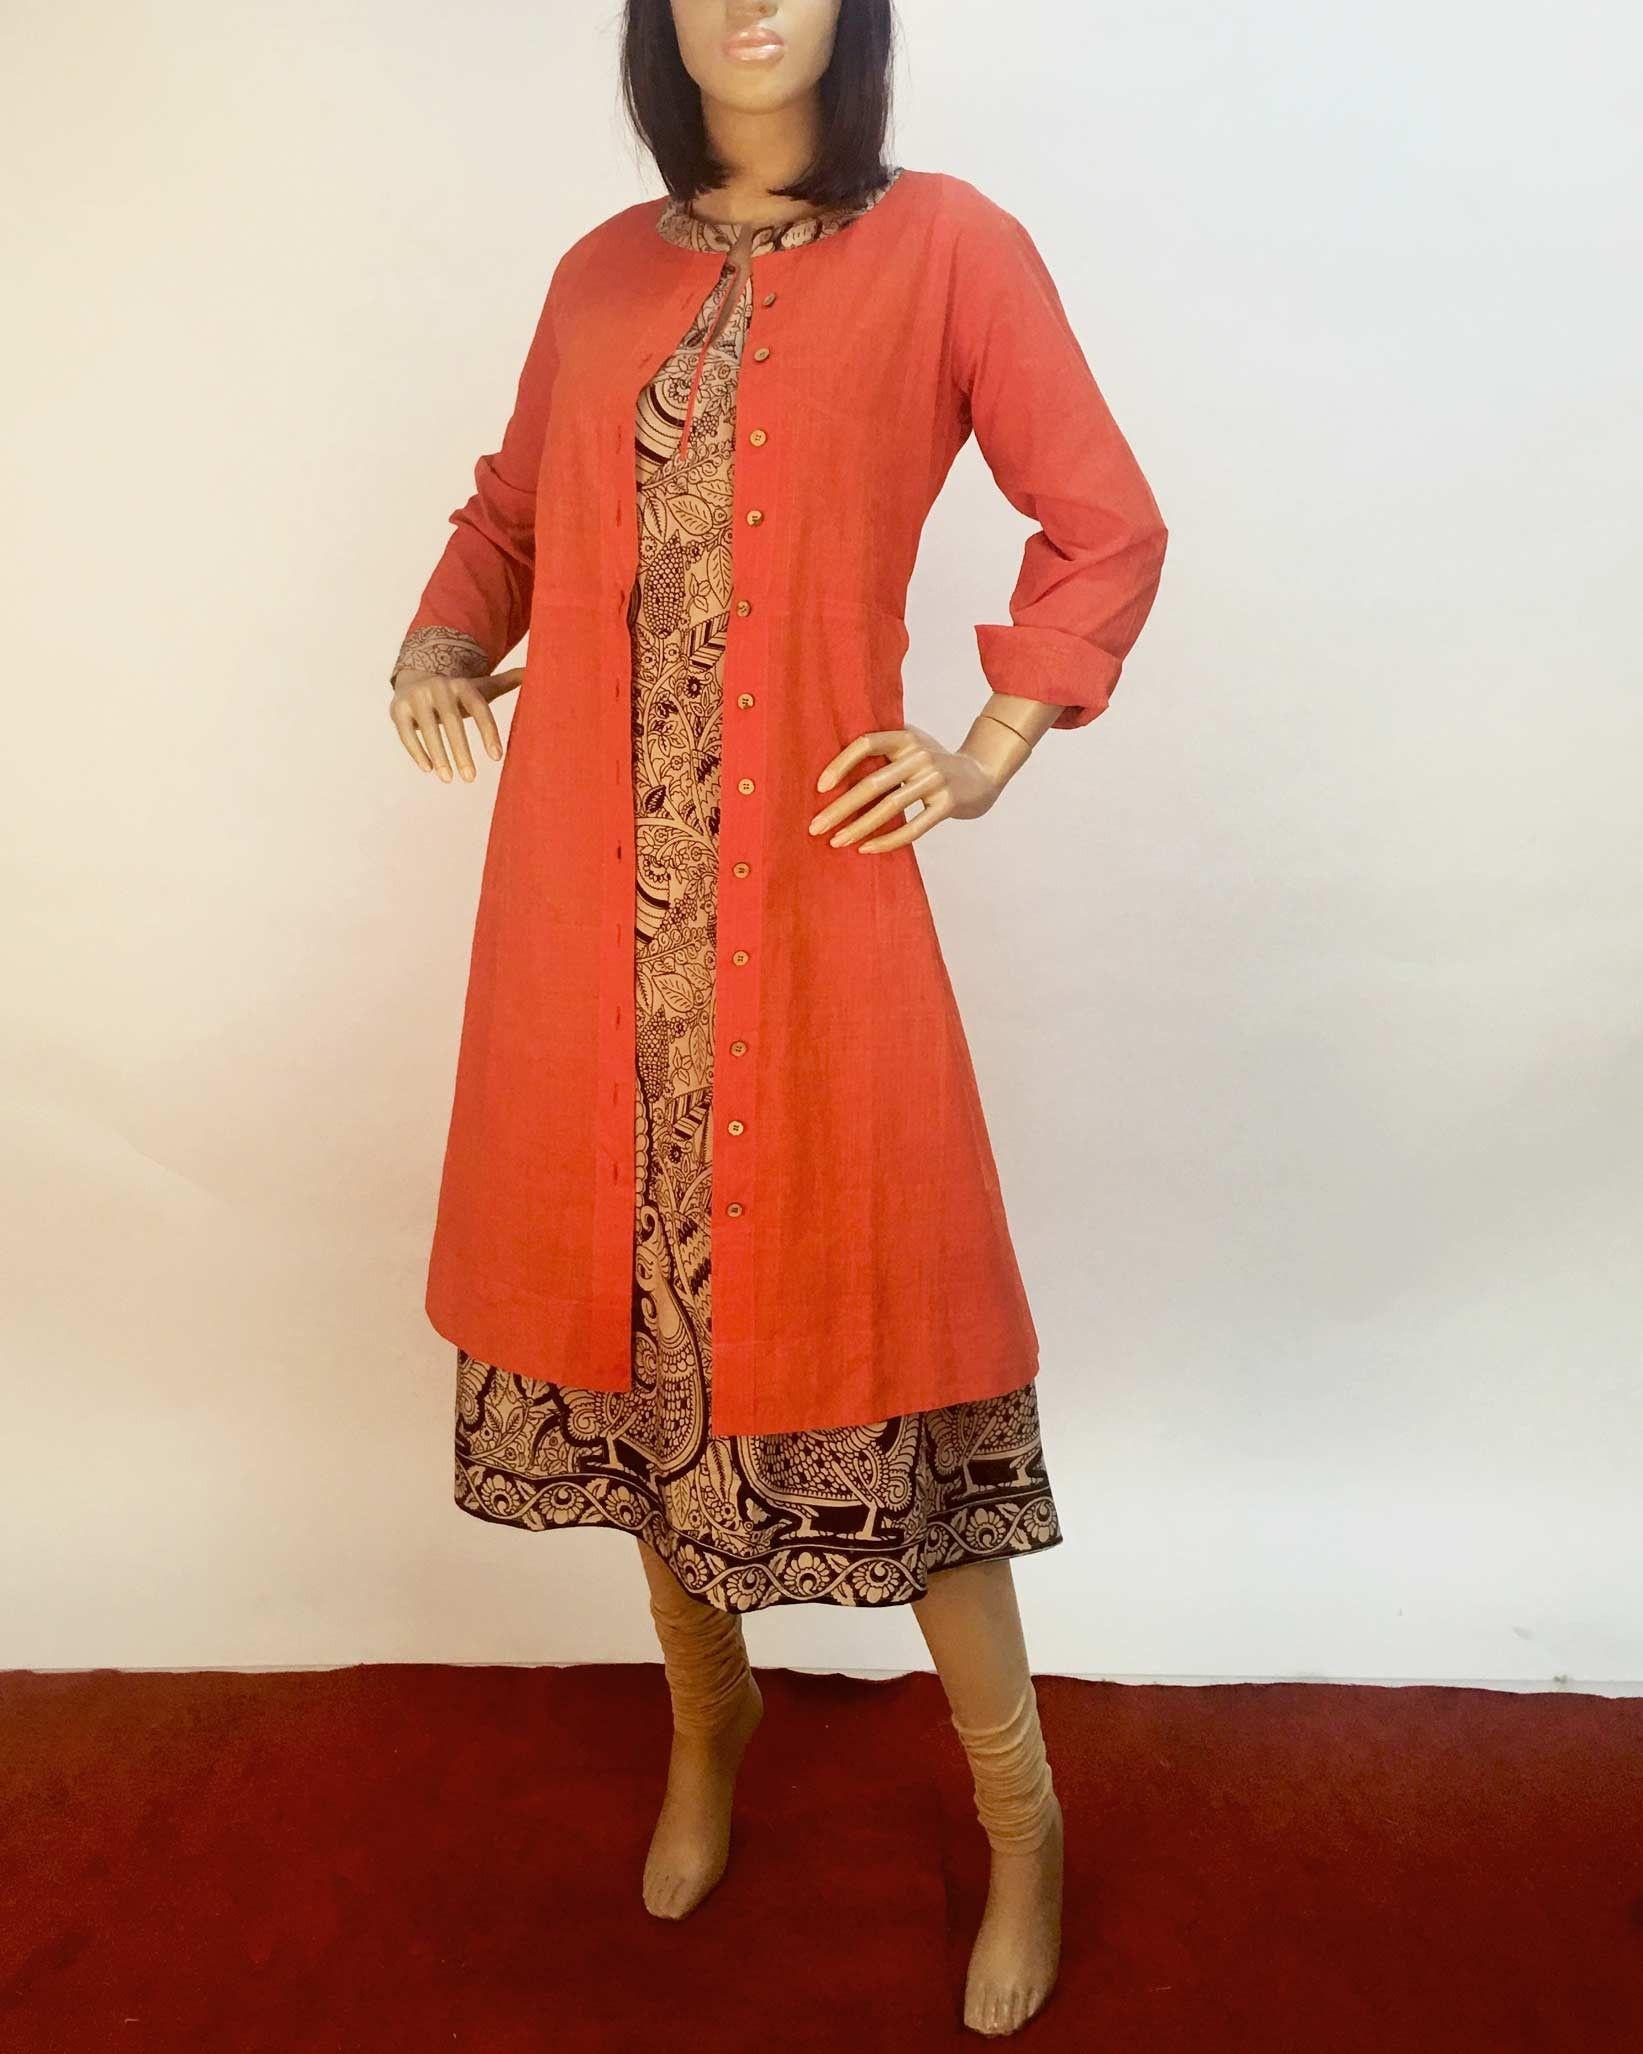 Orange U0026 Beige Pure Cotton Kurti Long Jacket | The Lookbook - Indian Western And Indo-Western ...